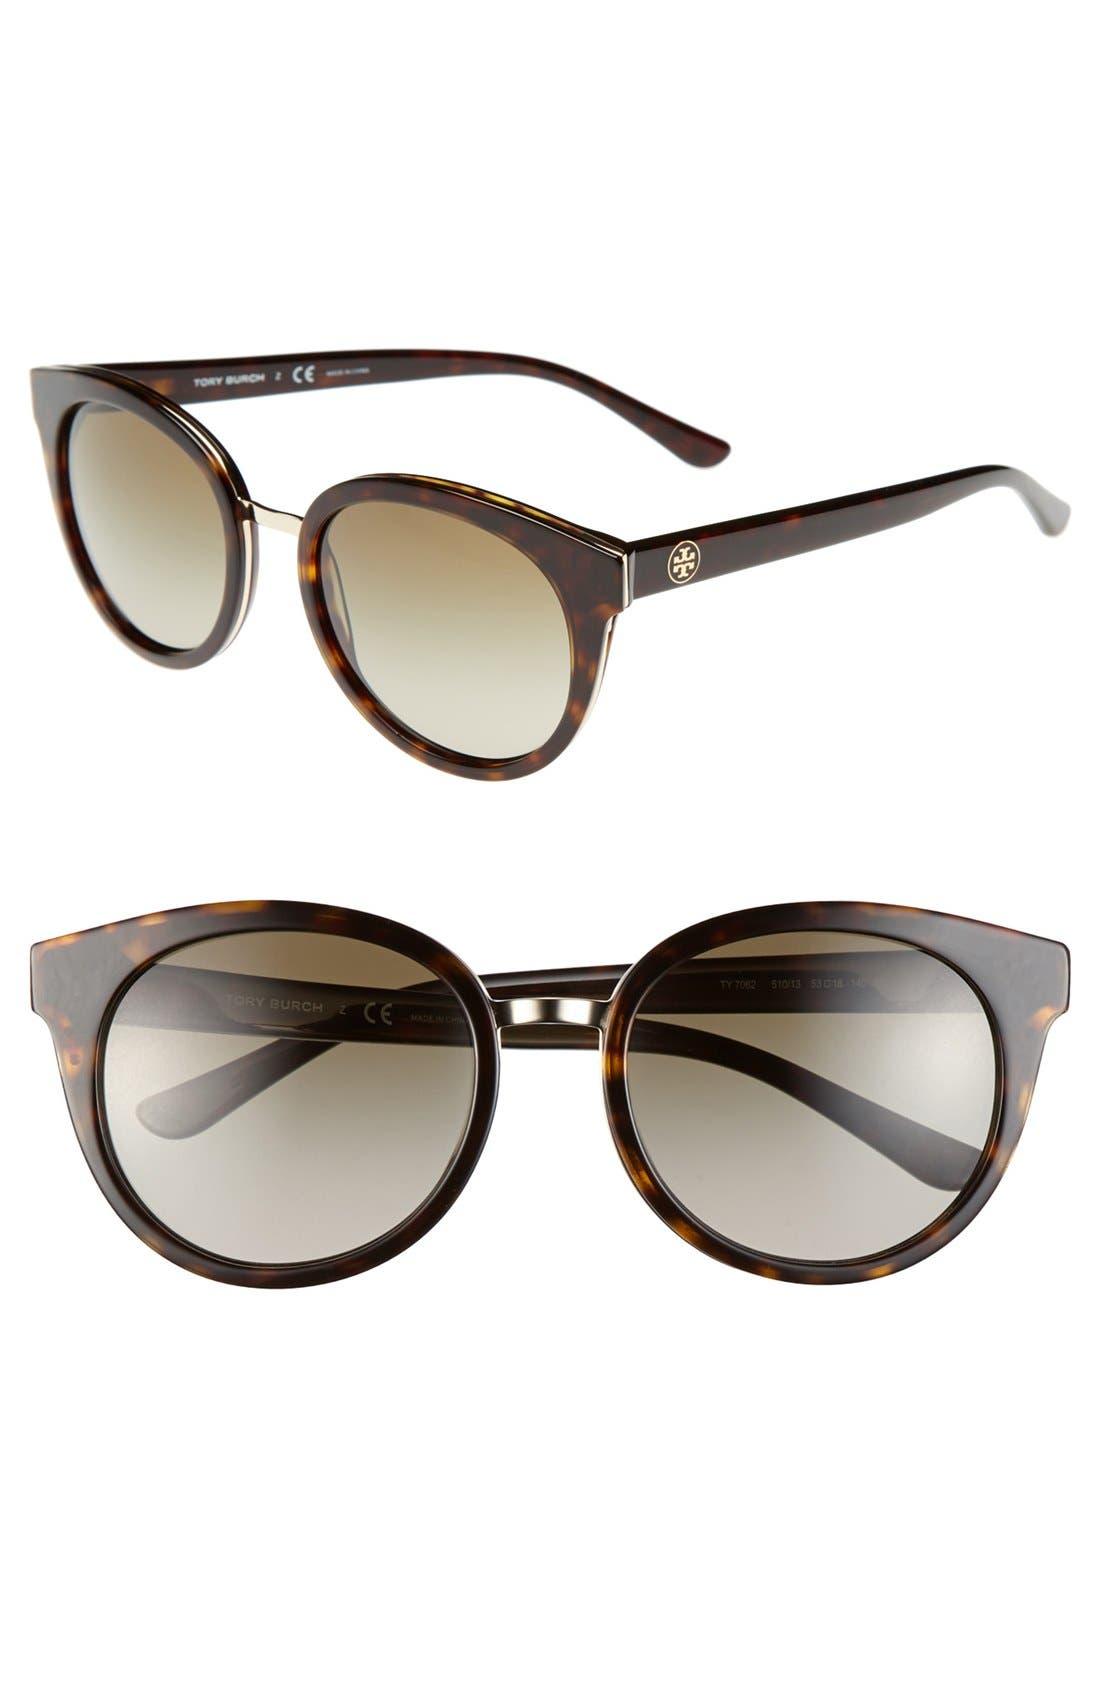 'Phantos' 53mm Retro Sunglasses,                             Main thumbnail 1, color,                             215